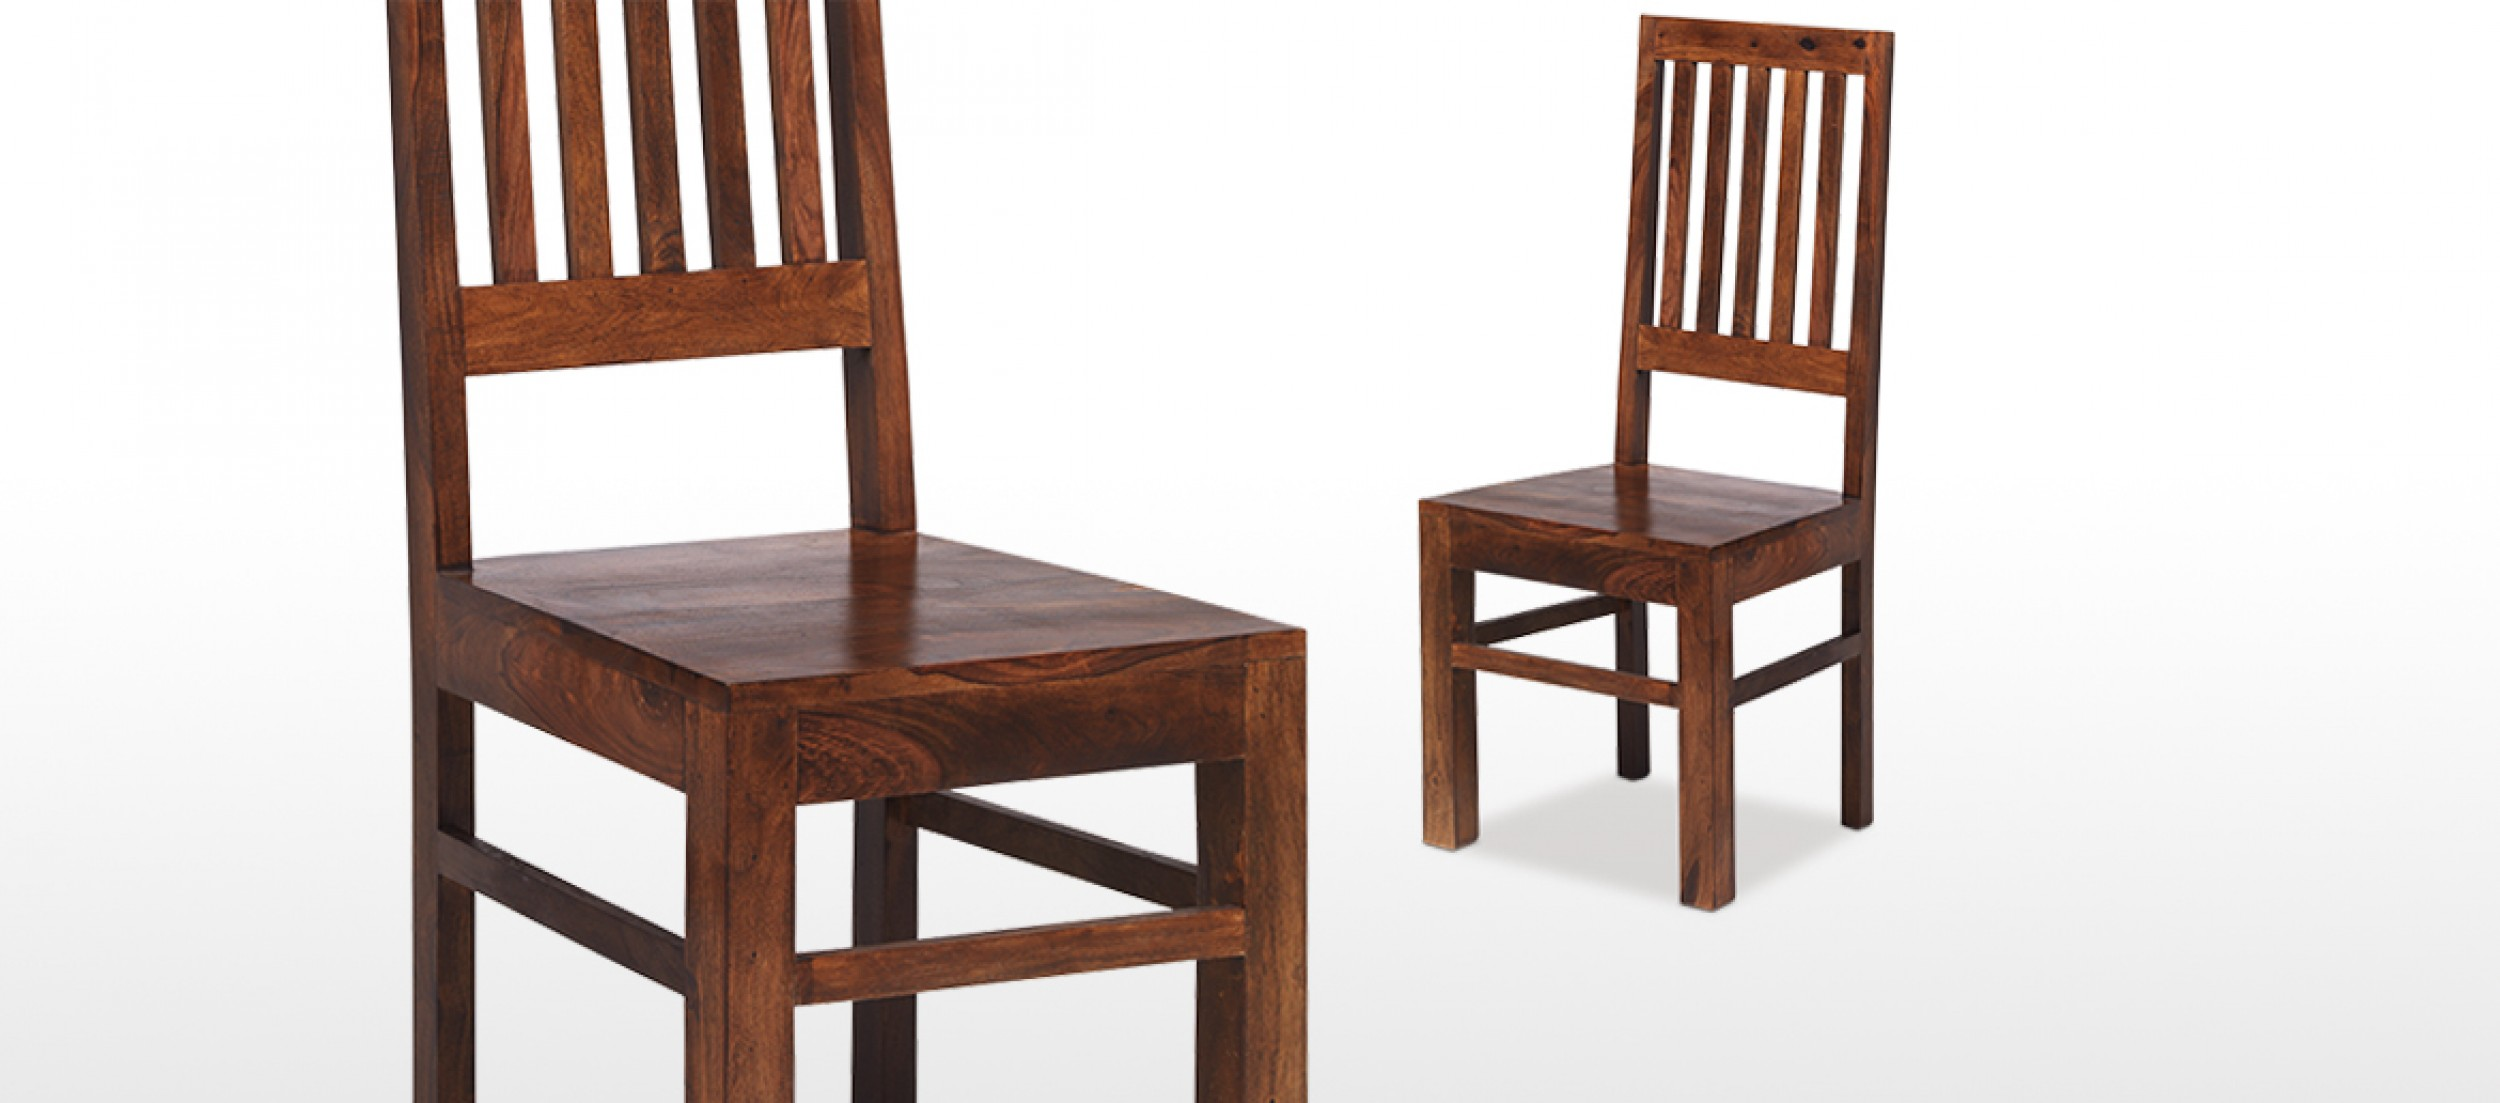 Jali Sheesham High Back Slat Dining Chairs